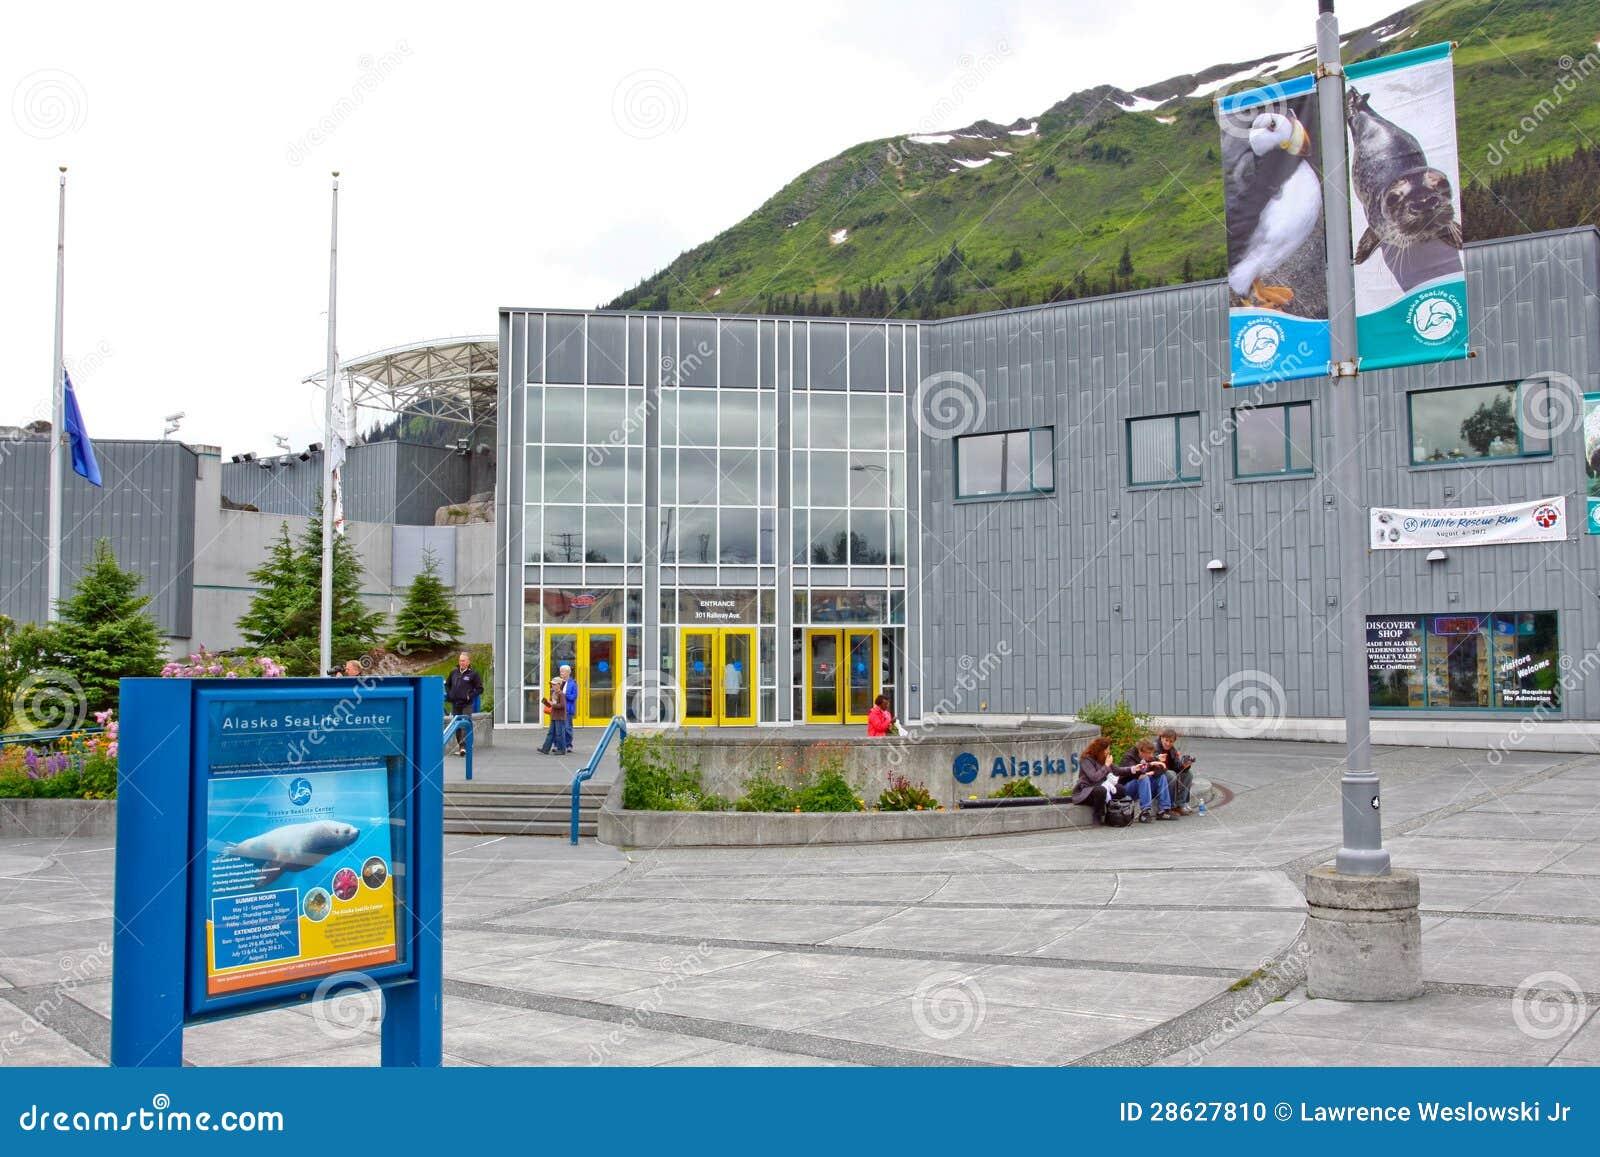 Alaska - Seward Alaska Sea Life Center 2 Editorial Image - Image ...